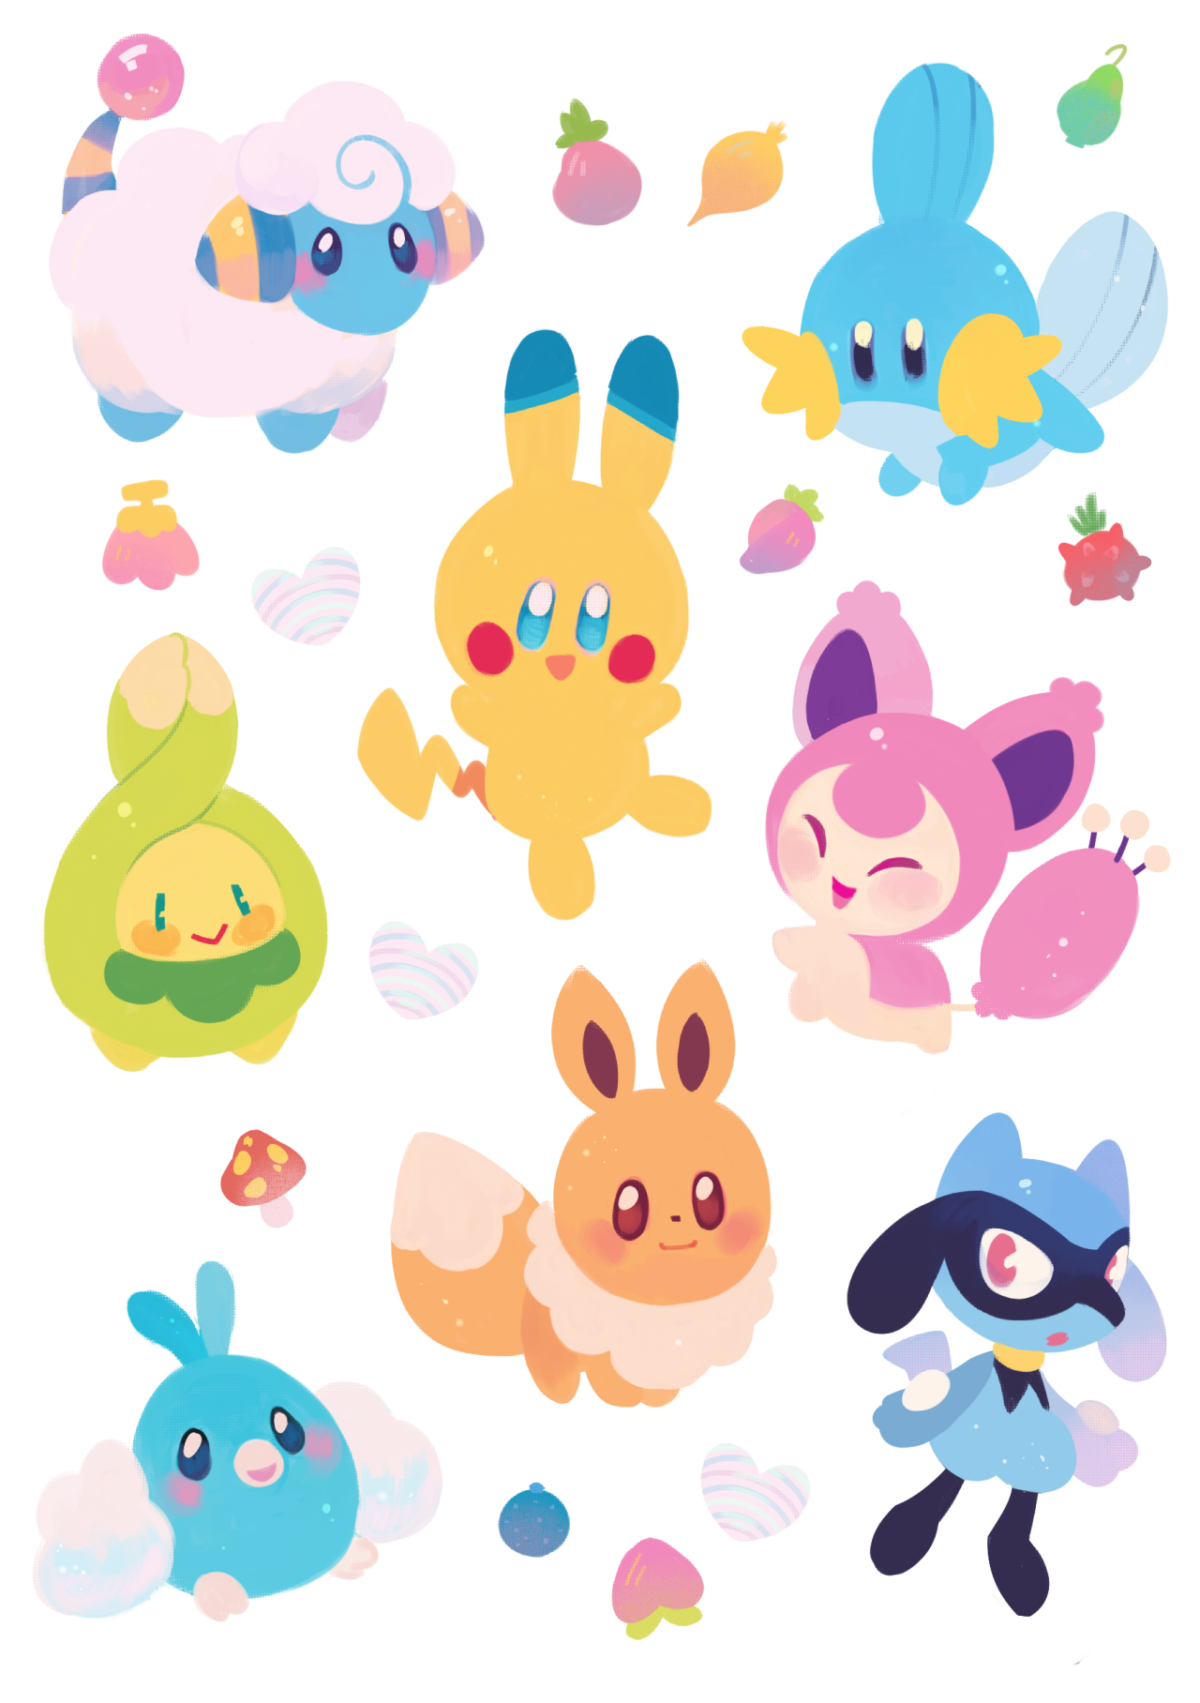 Mareep, Pikachu, Mudkip, Budew, Skitty, Eevee, Swablu, and Riolu …